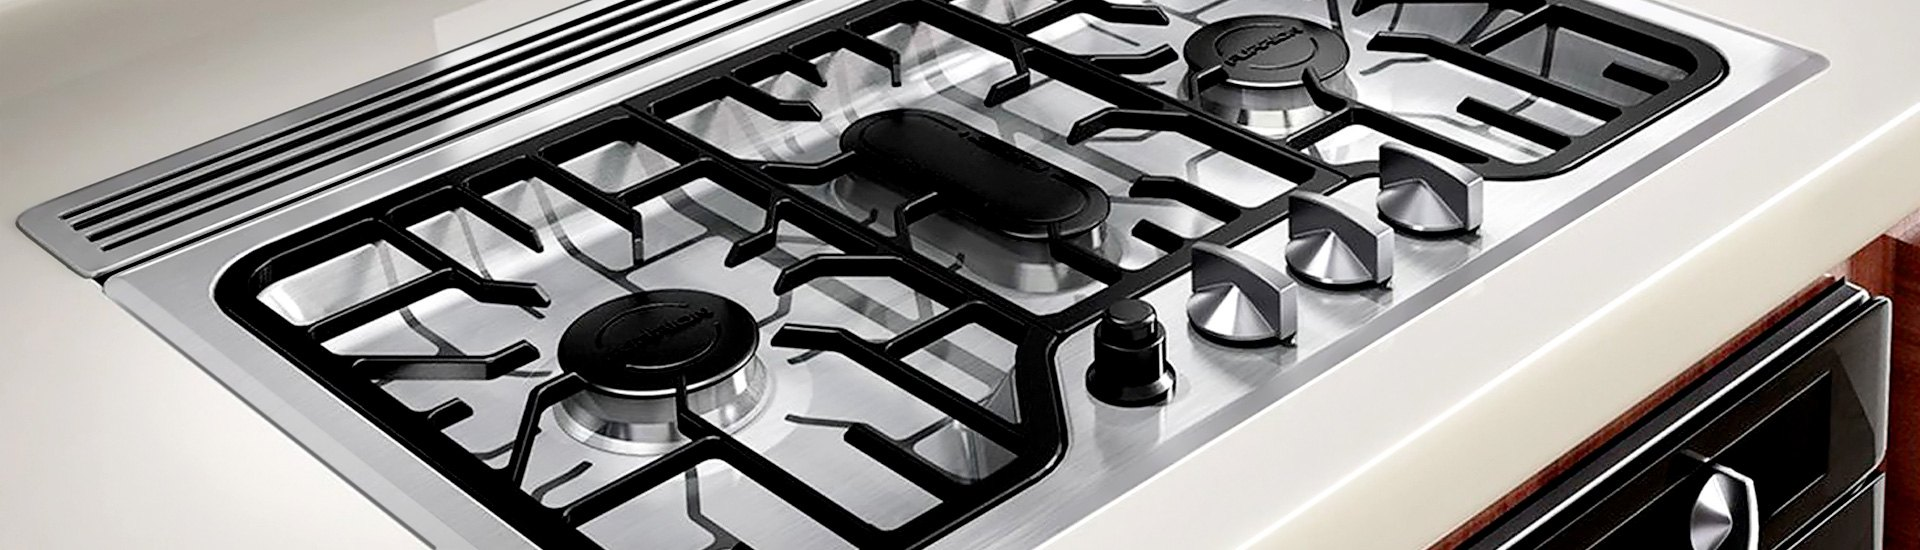 RV Washers, Dryers, Cooktop Ranges & Dishwashers   Roadworthy Appliances